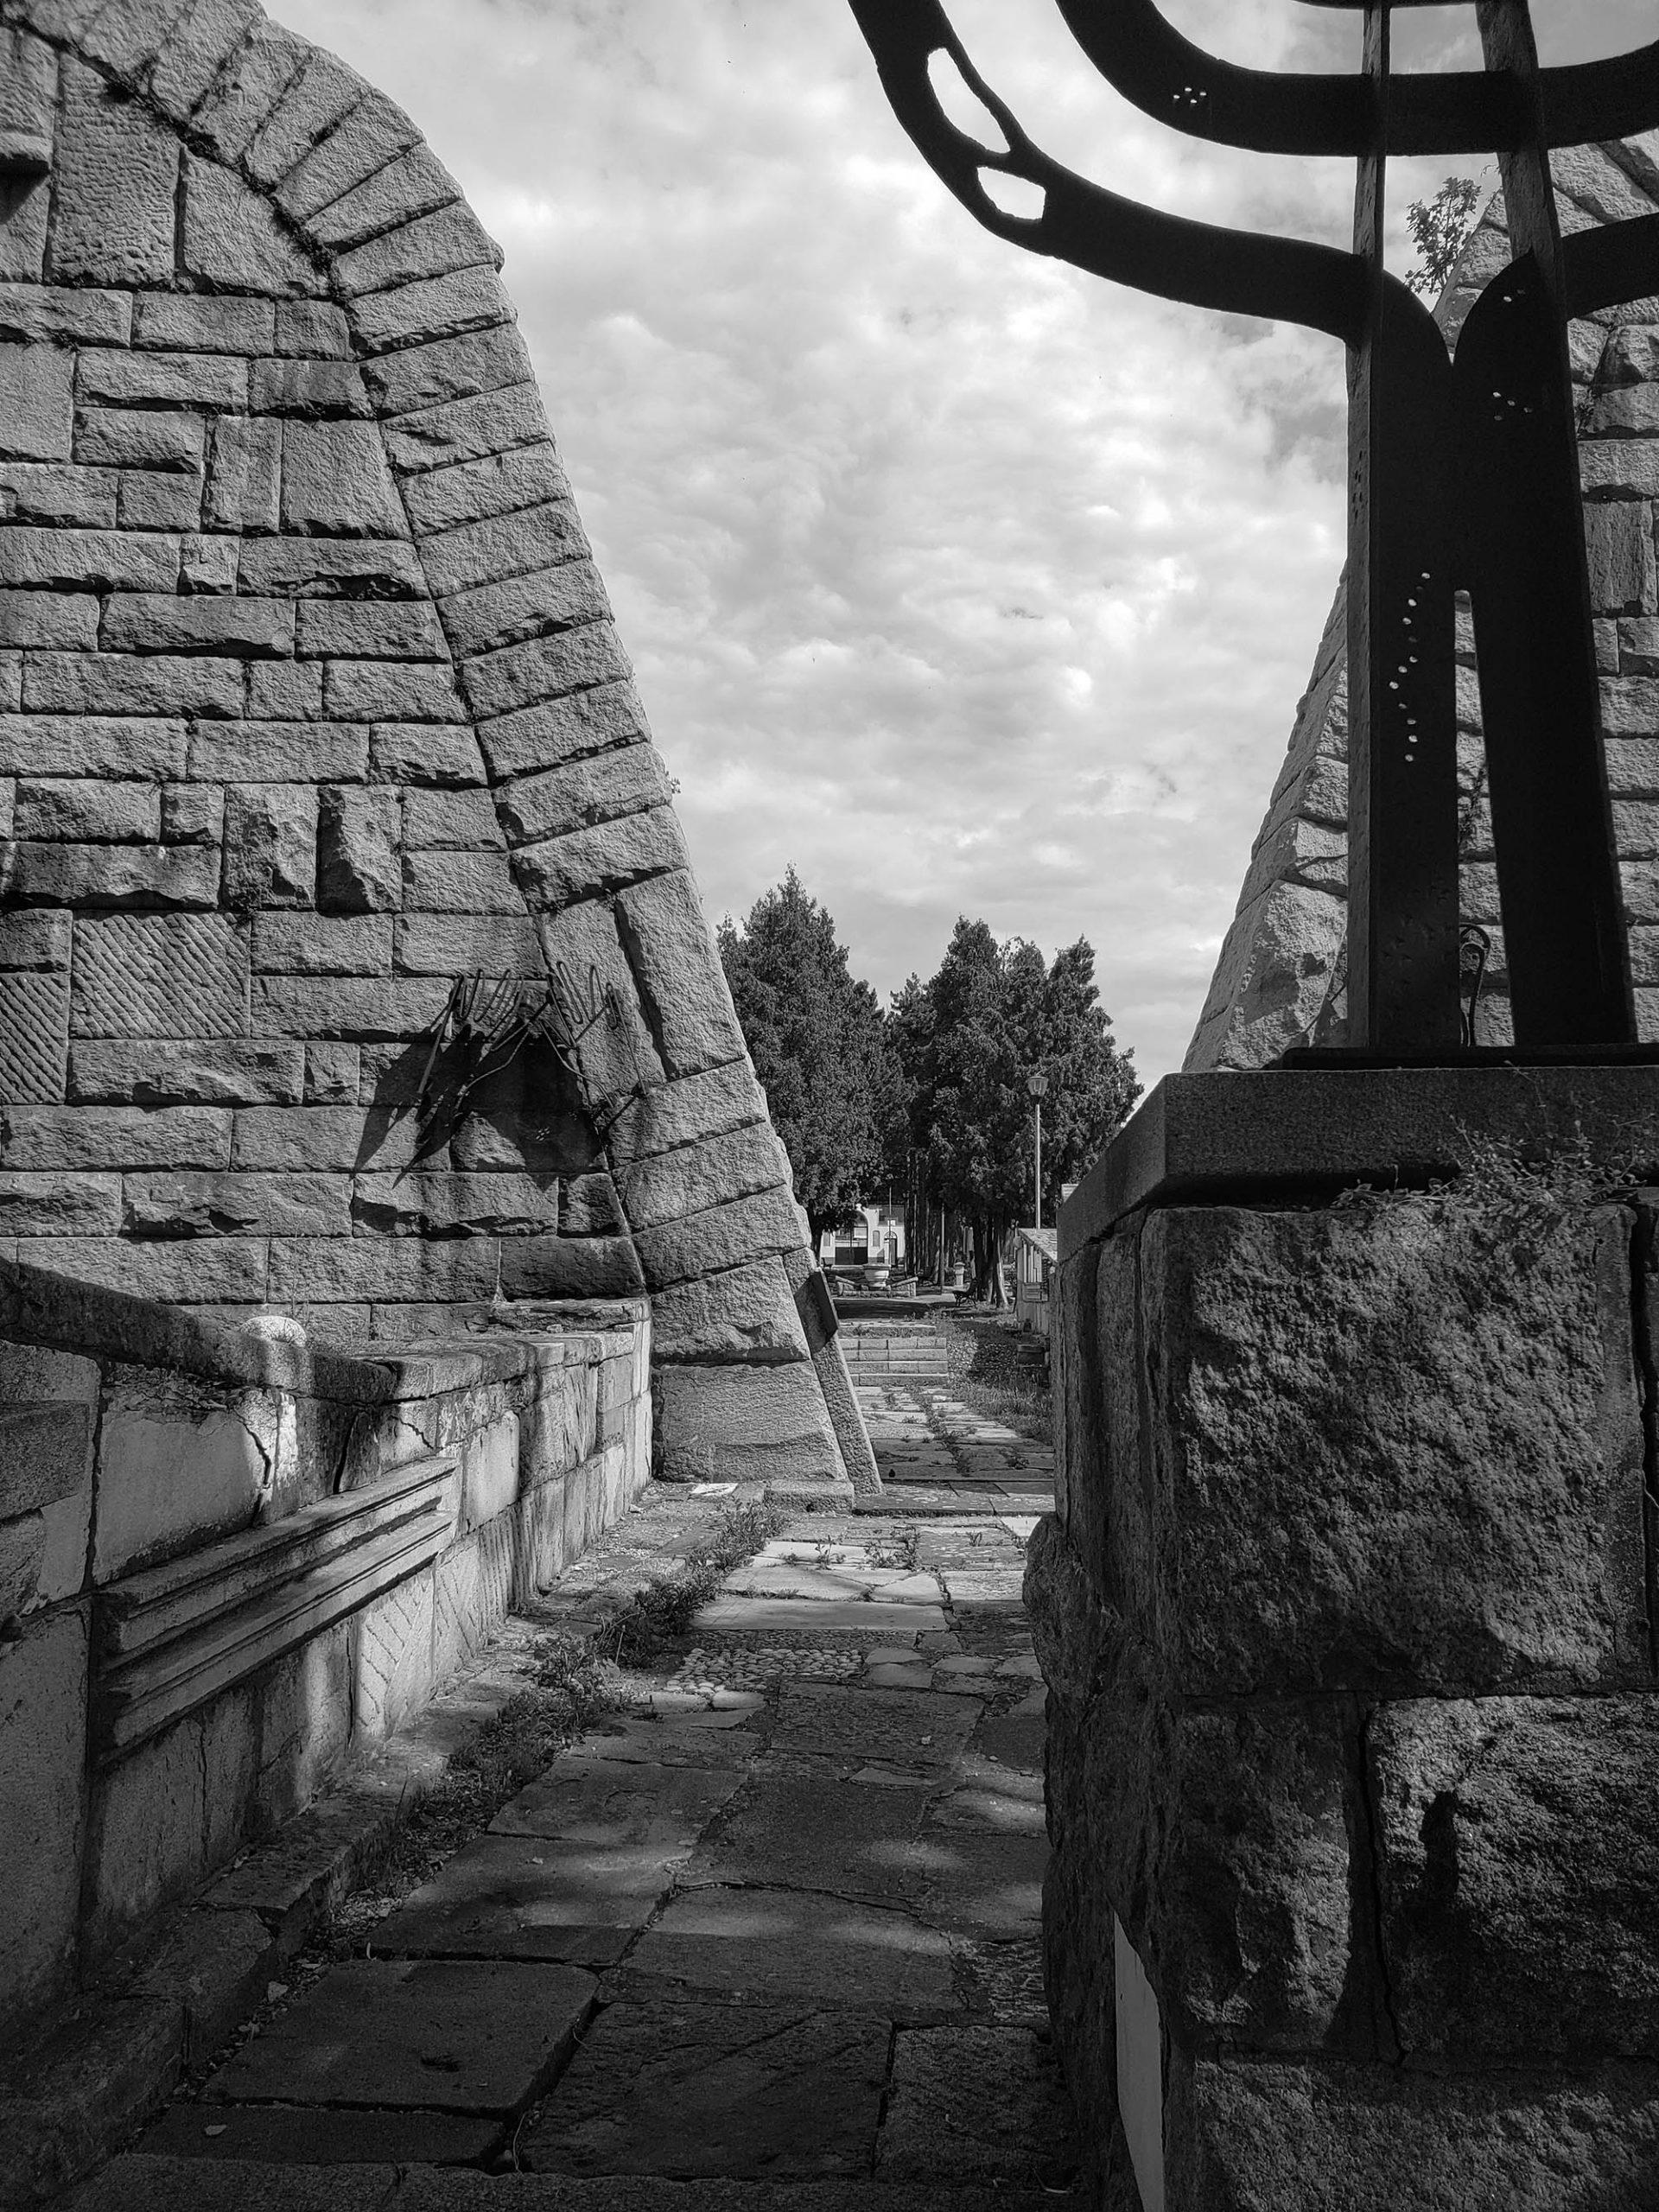 Jovana Crnomarkovic - Memorial to the Jewish Victims of Fascism